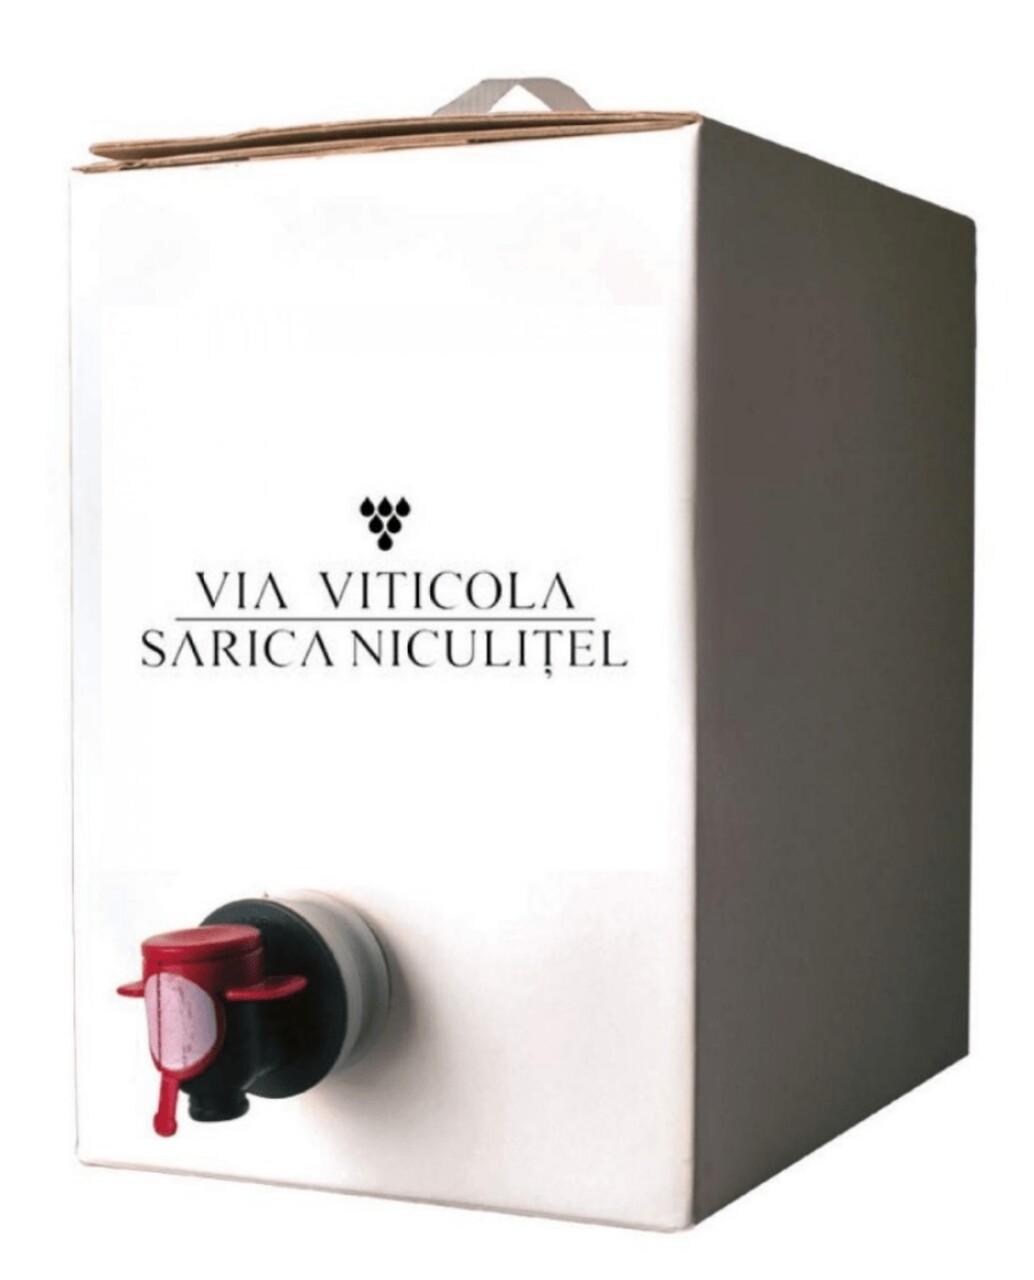 Sarica Niculitel Aligole Smouth Breeze Rose BIB 3L